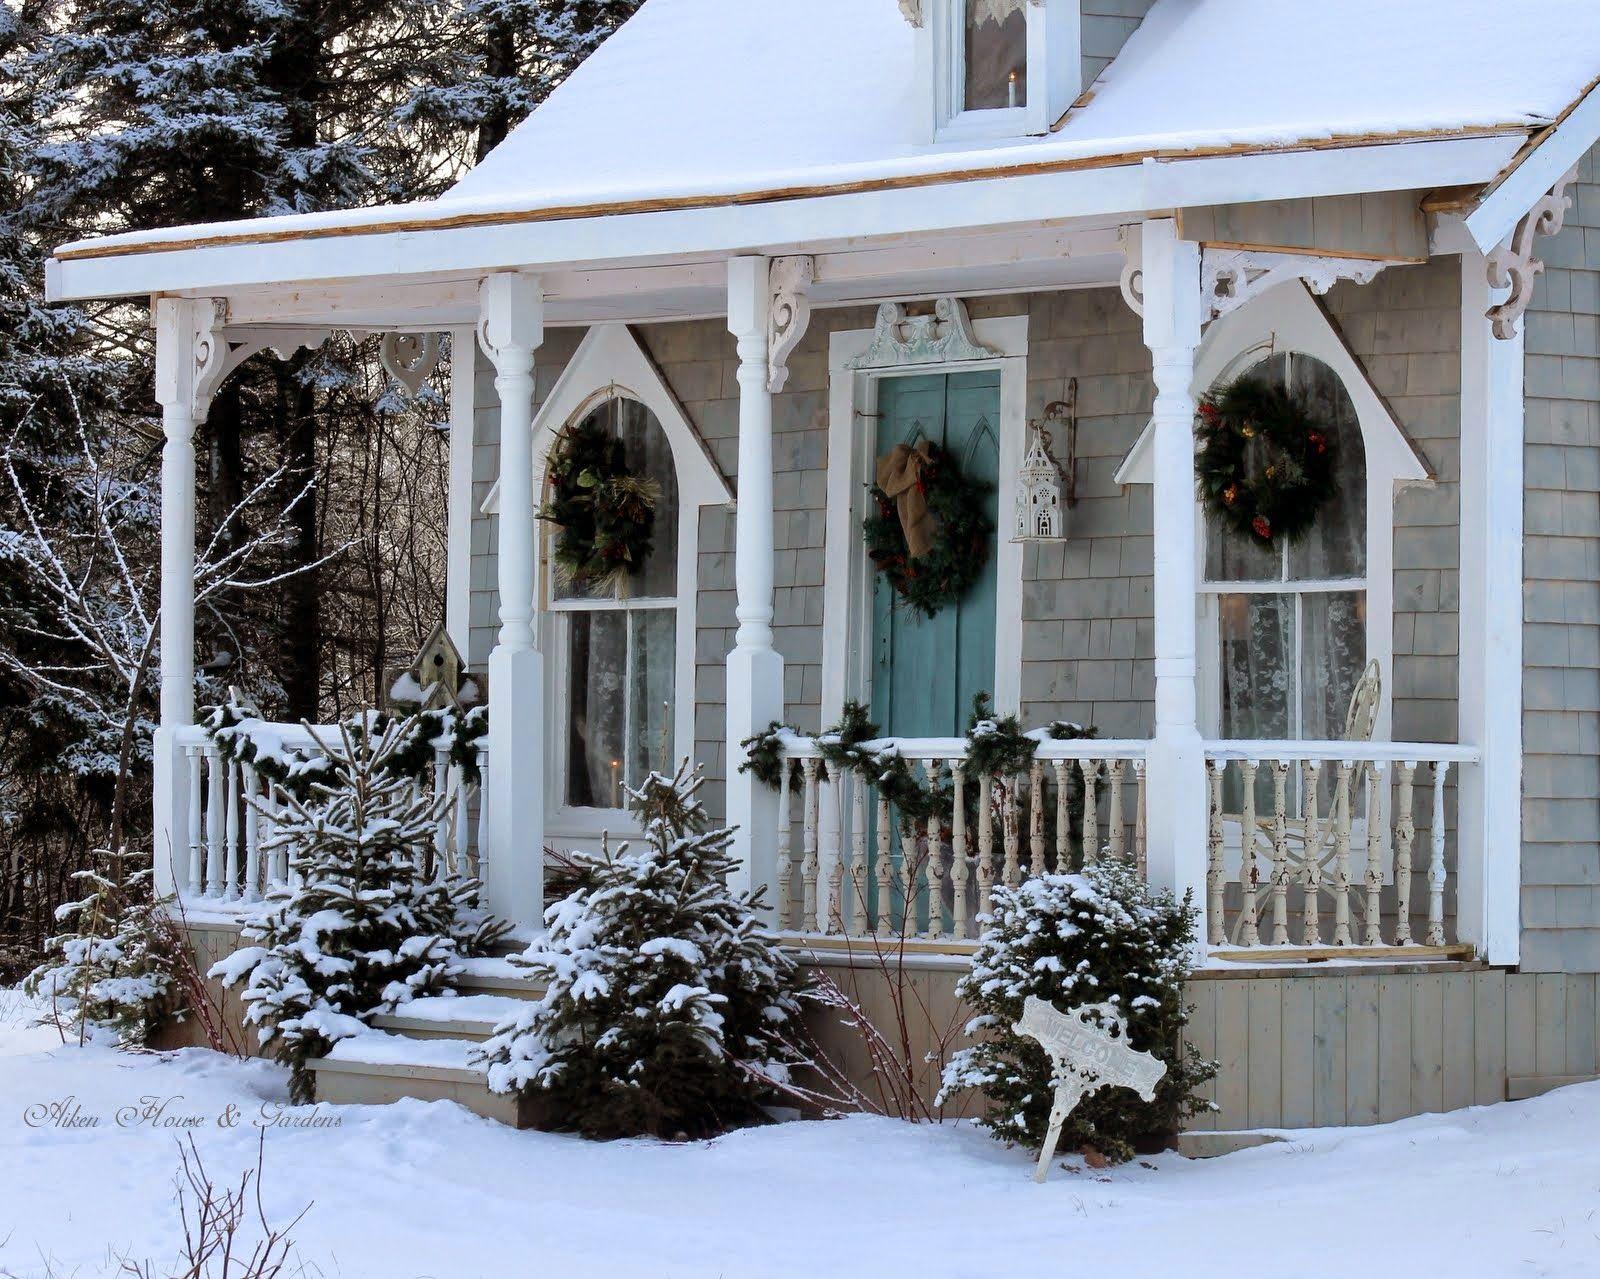 Aiken House & Gardens * English Country Style